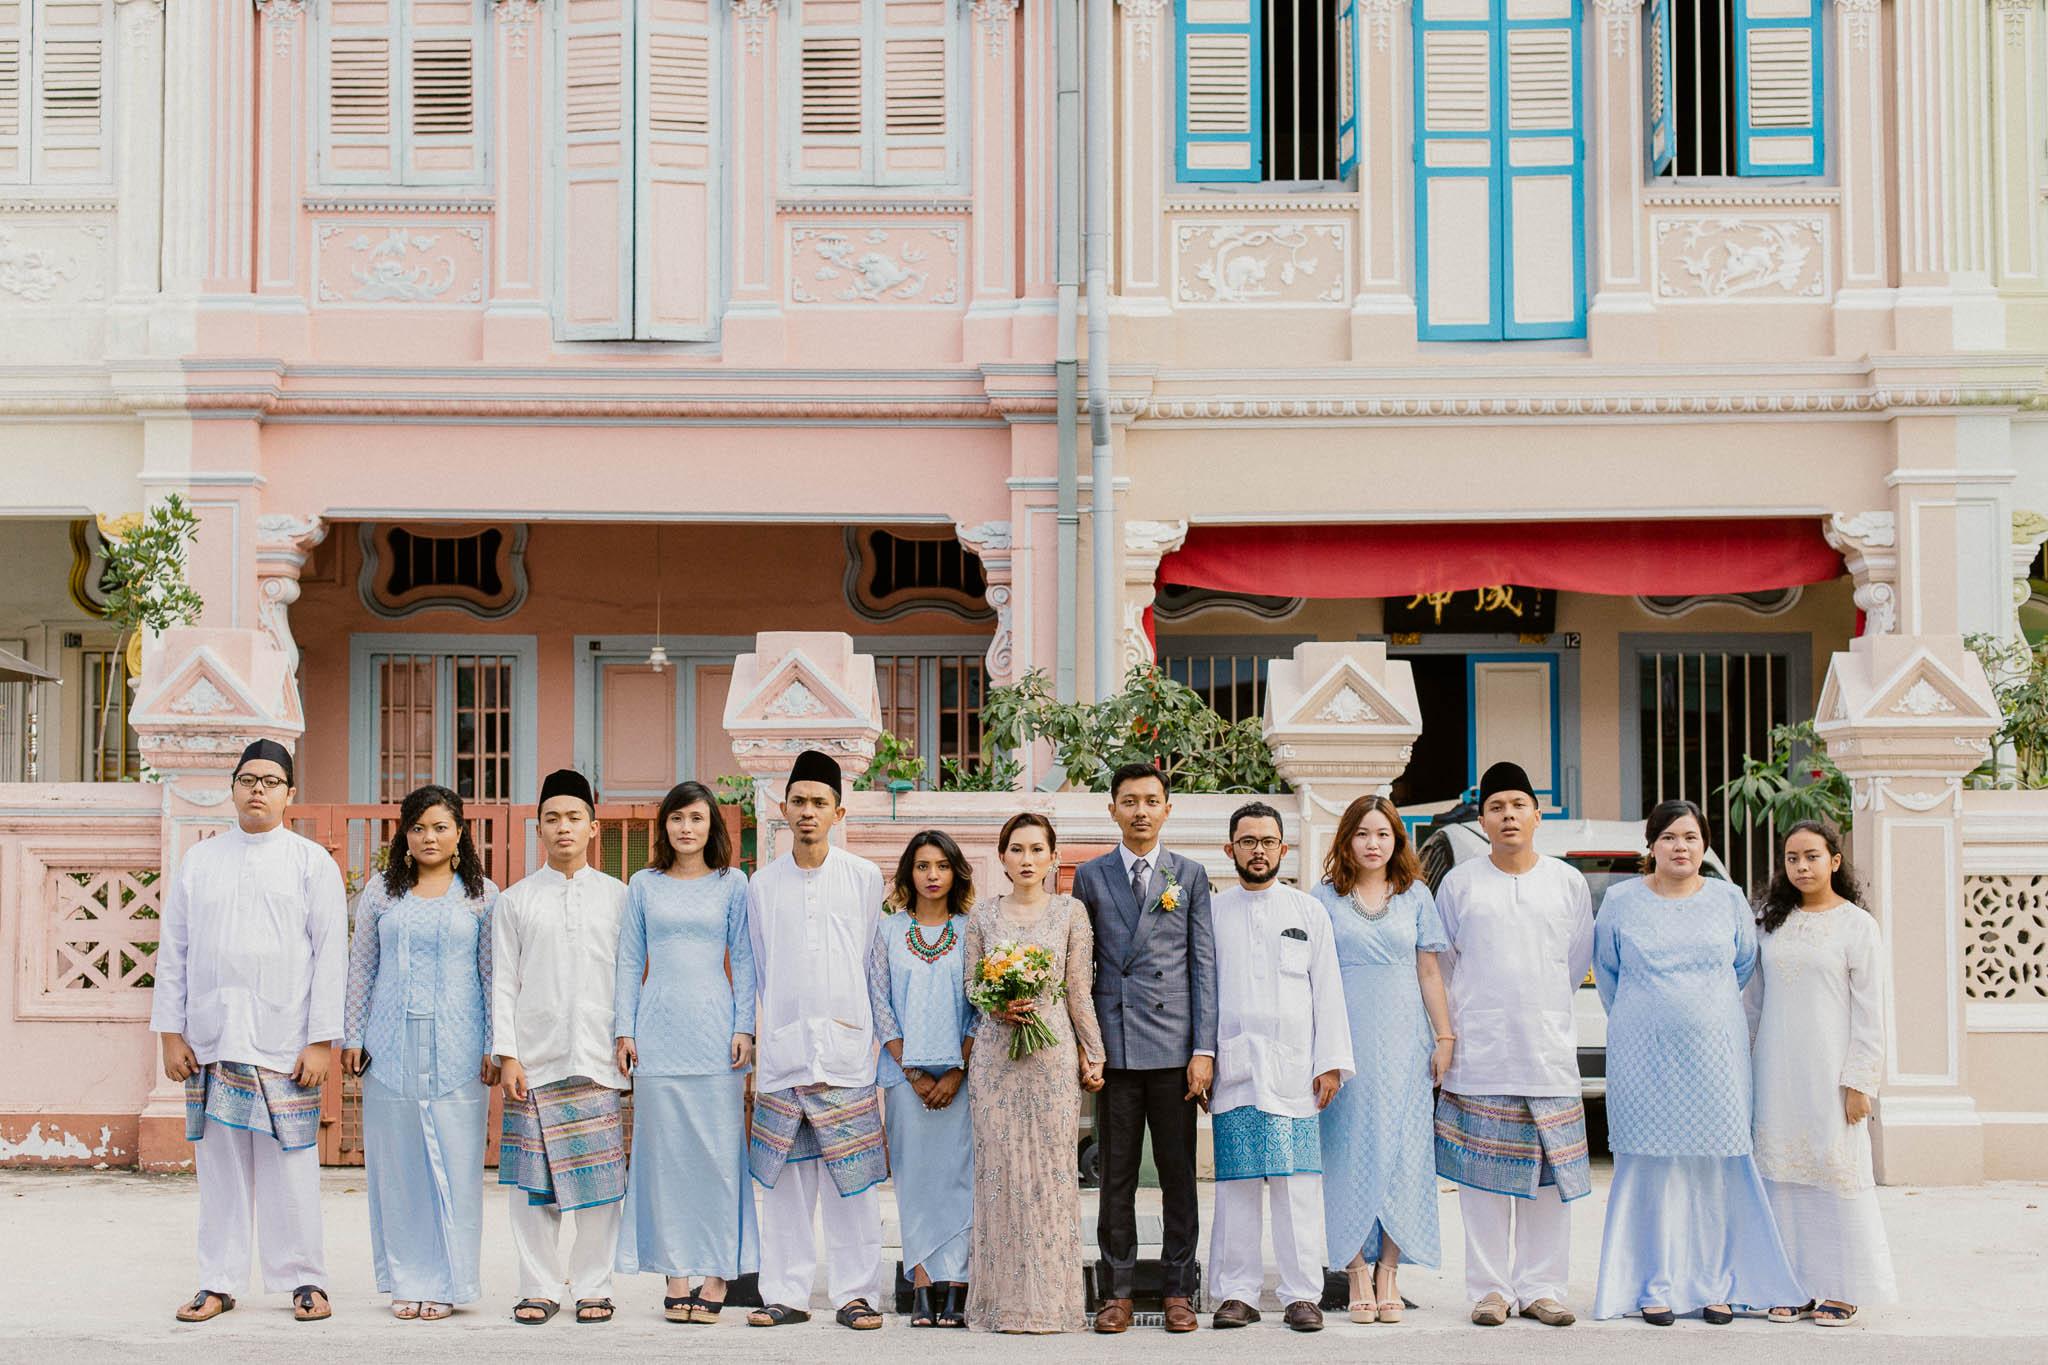 singapore-wedding-photographer-addafiq-nufail-068.jpg